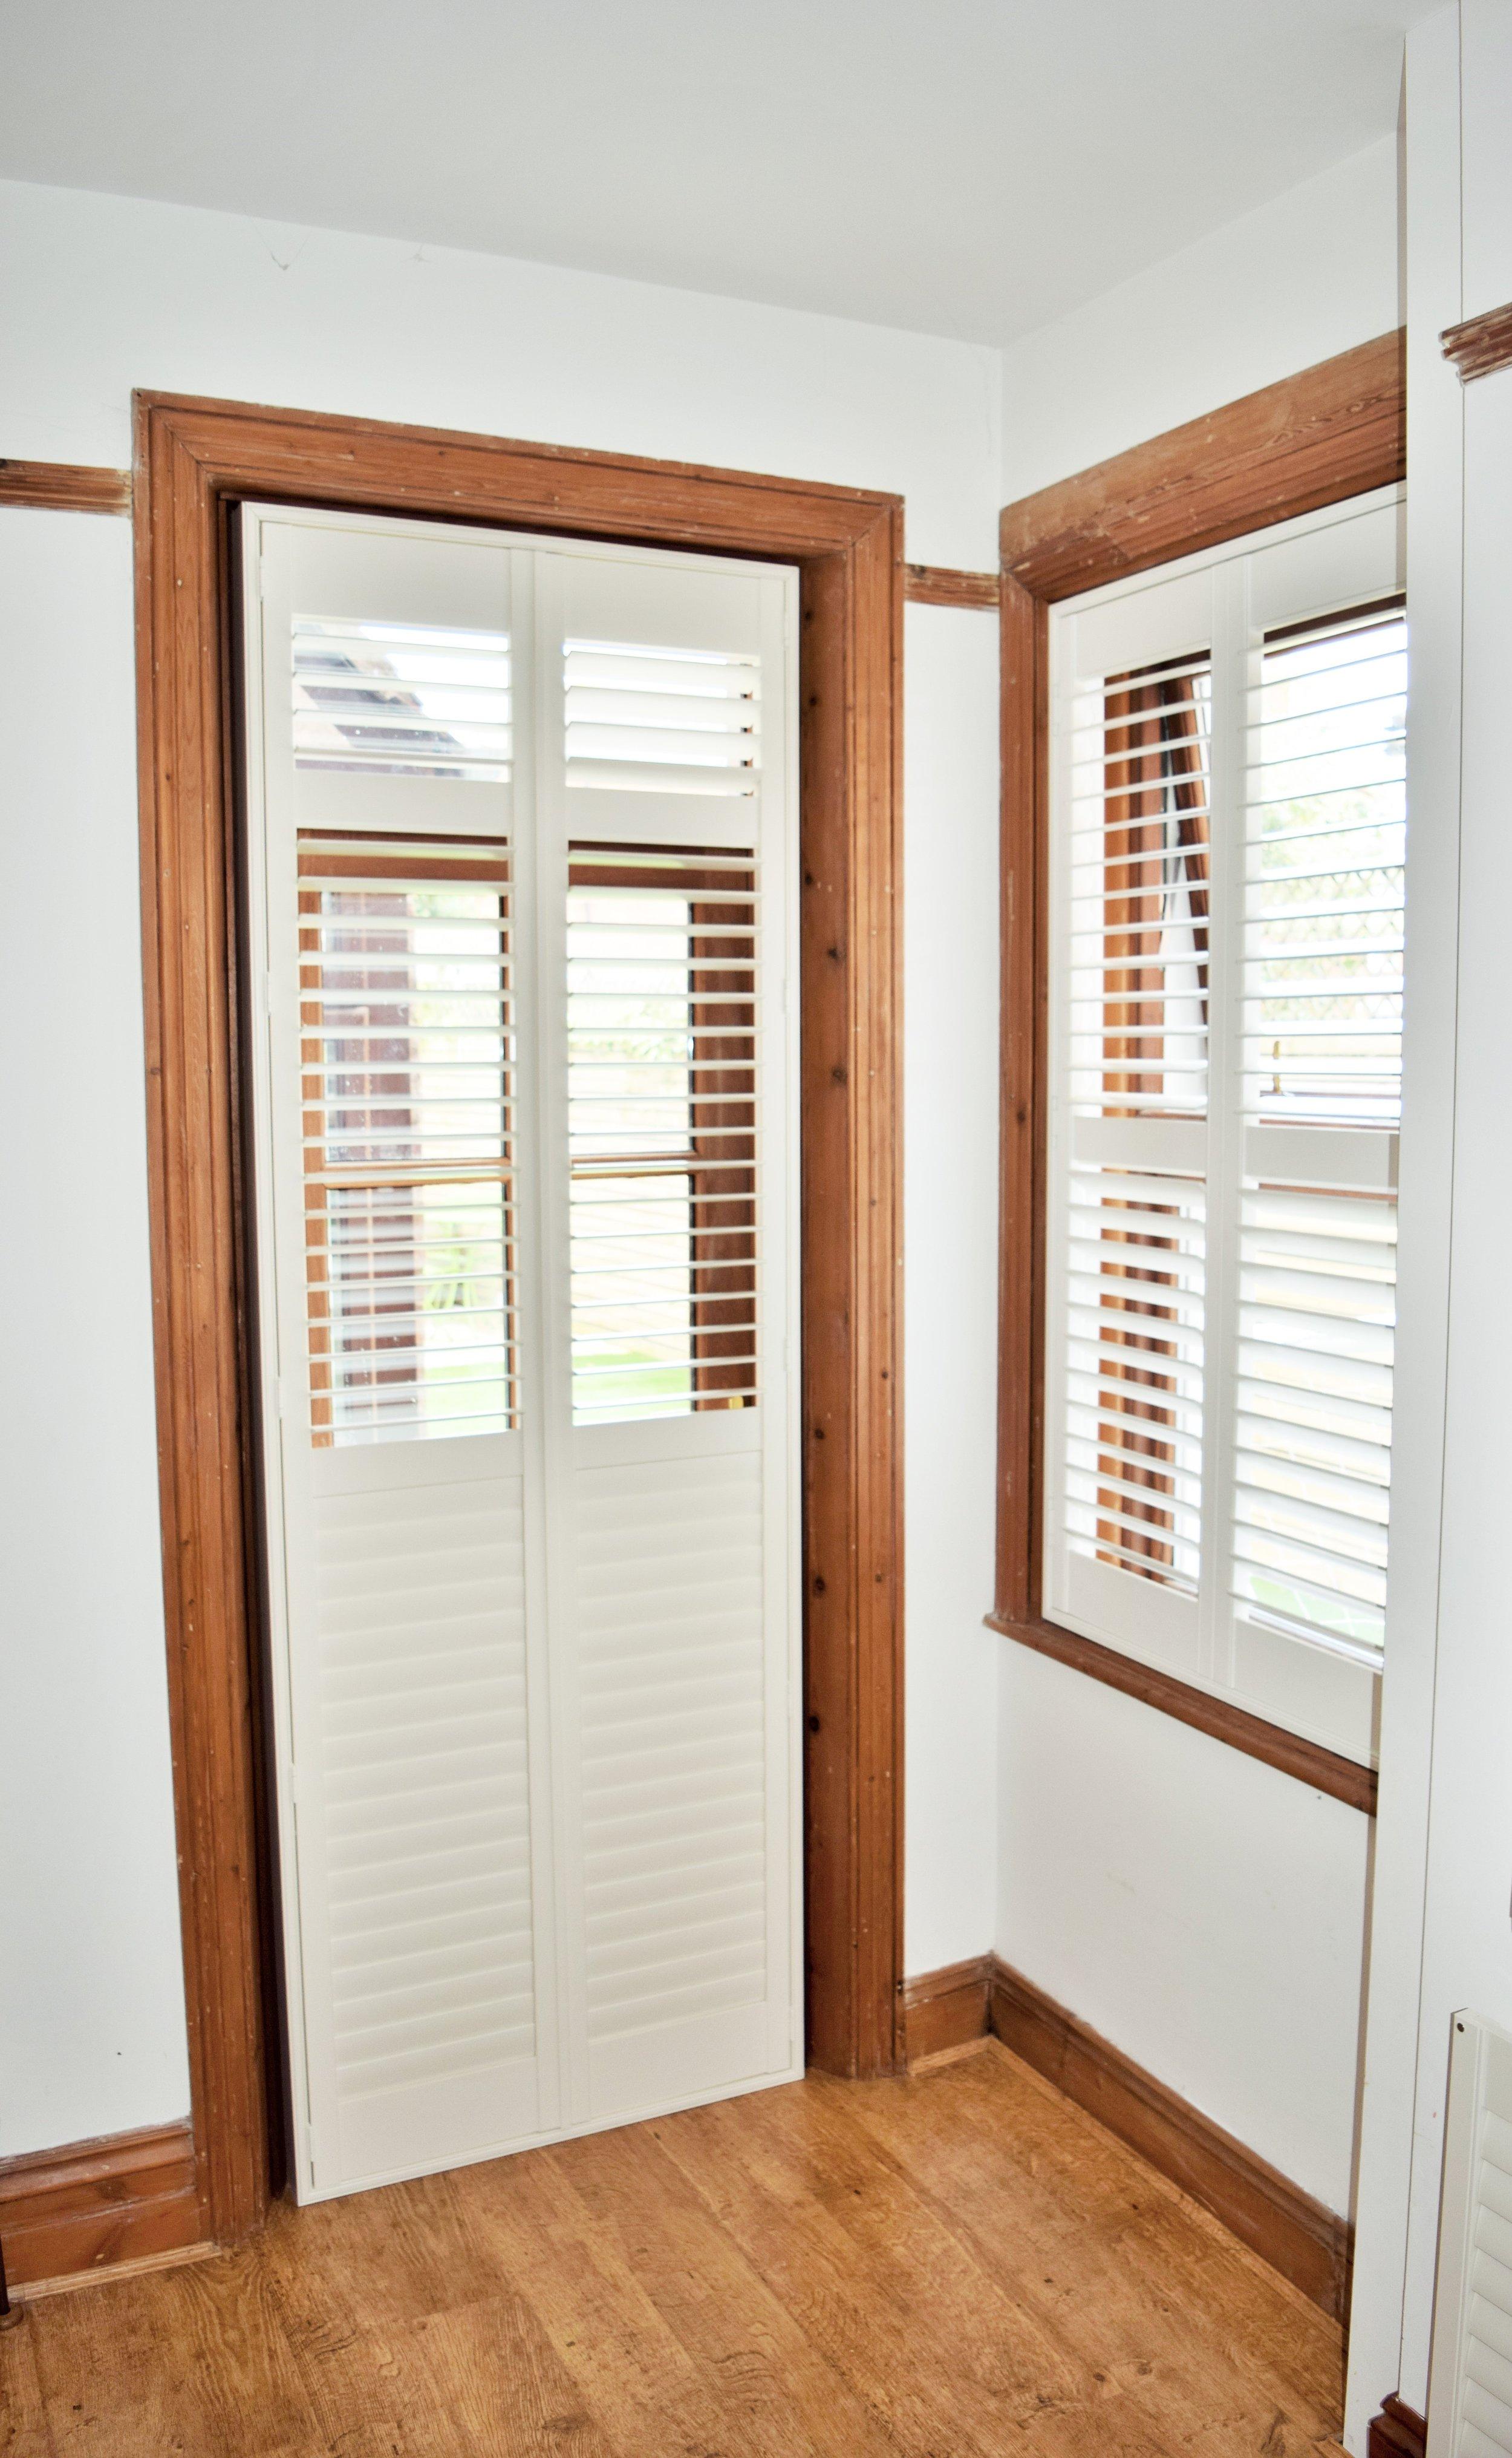 Patio doors plantation shutters Christchurch Bournemouth Poole Dorset.JPG